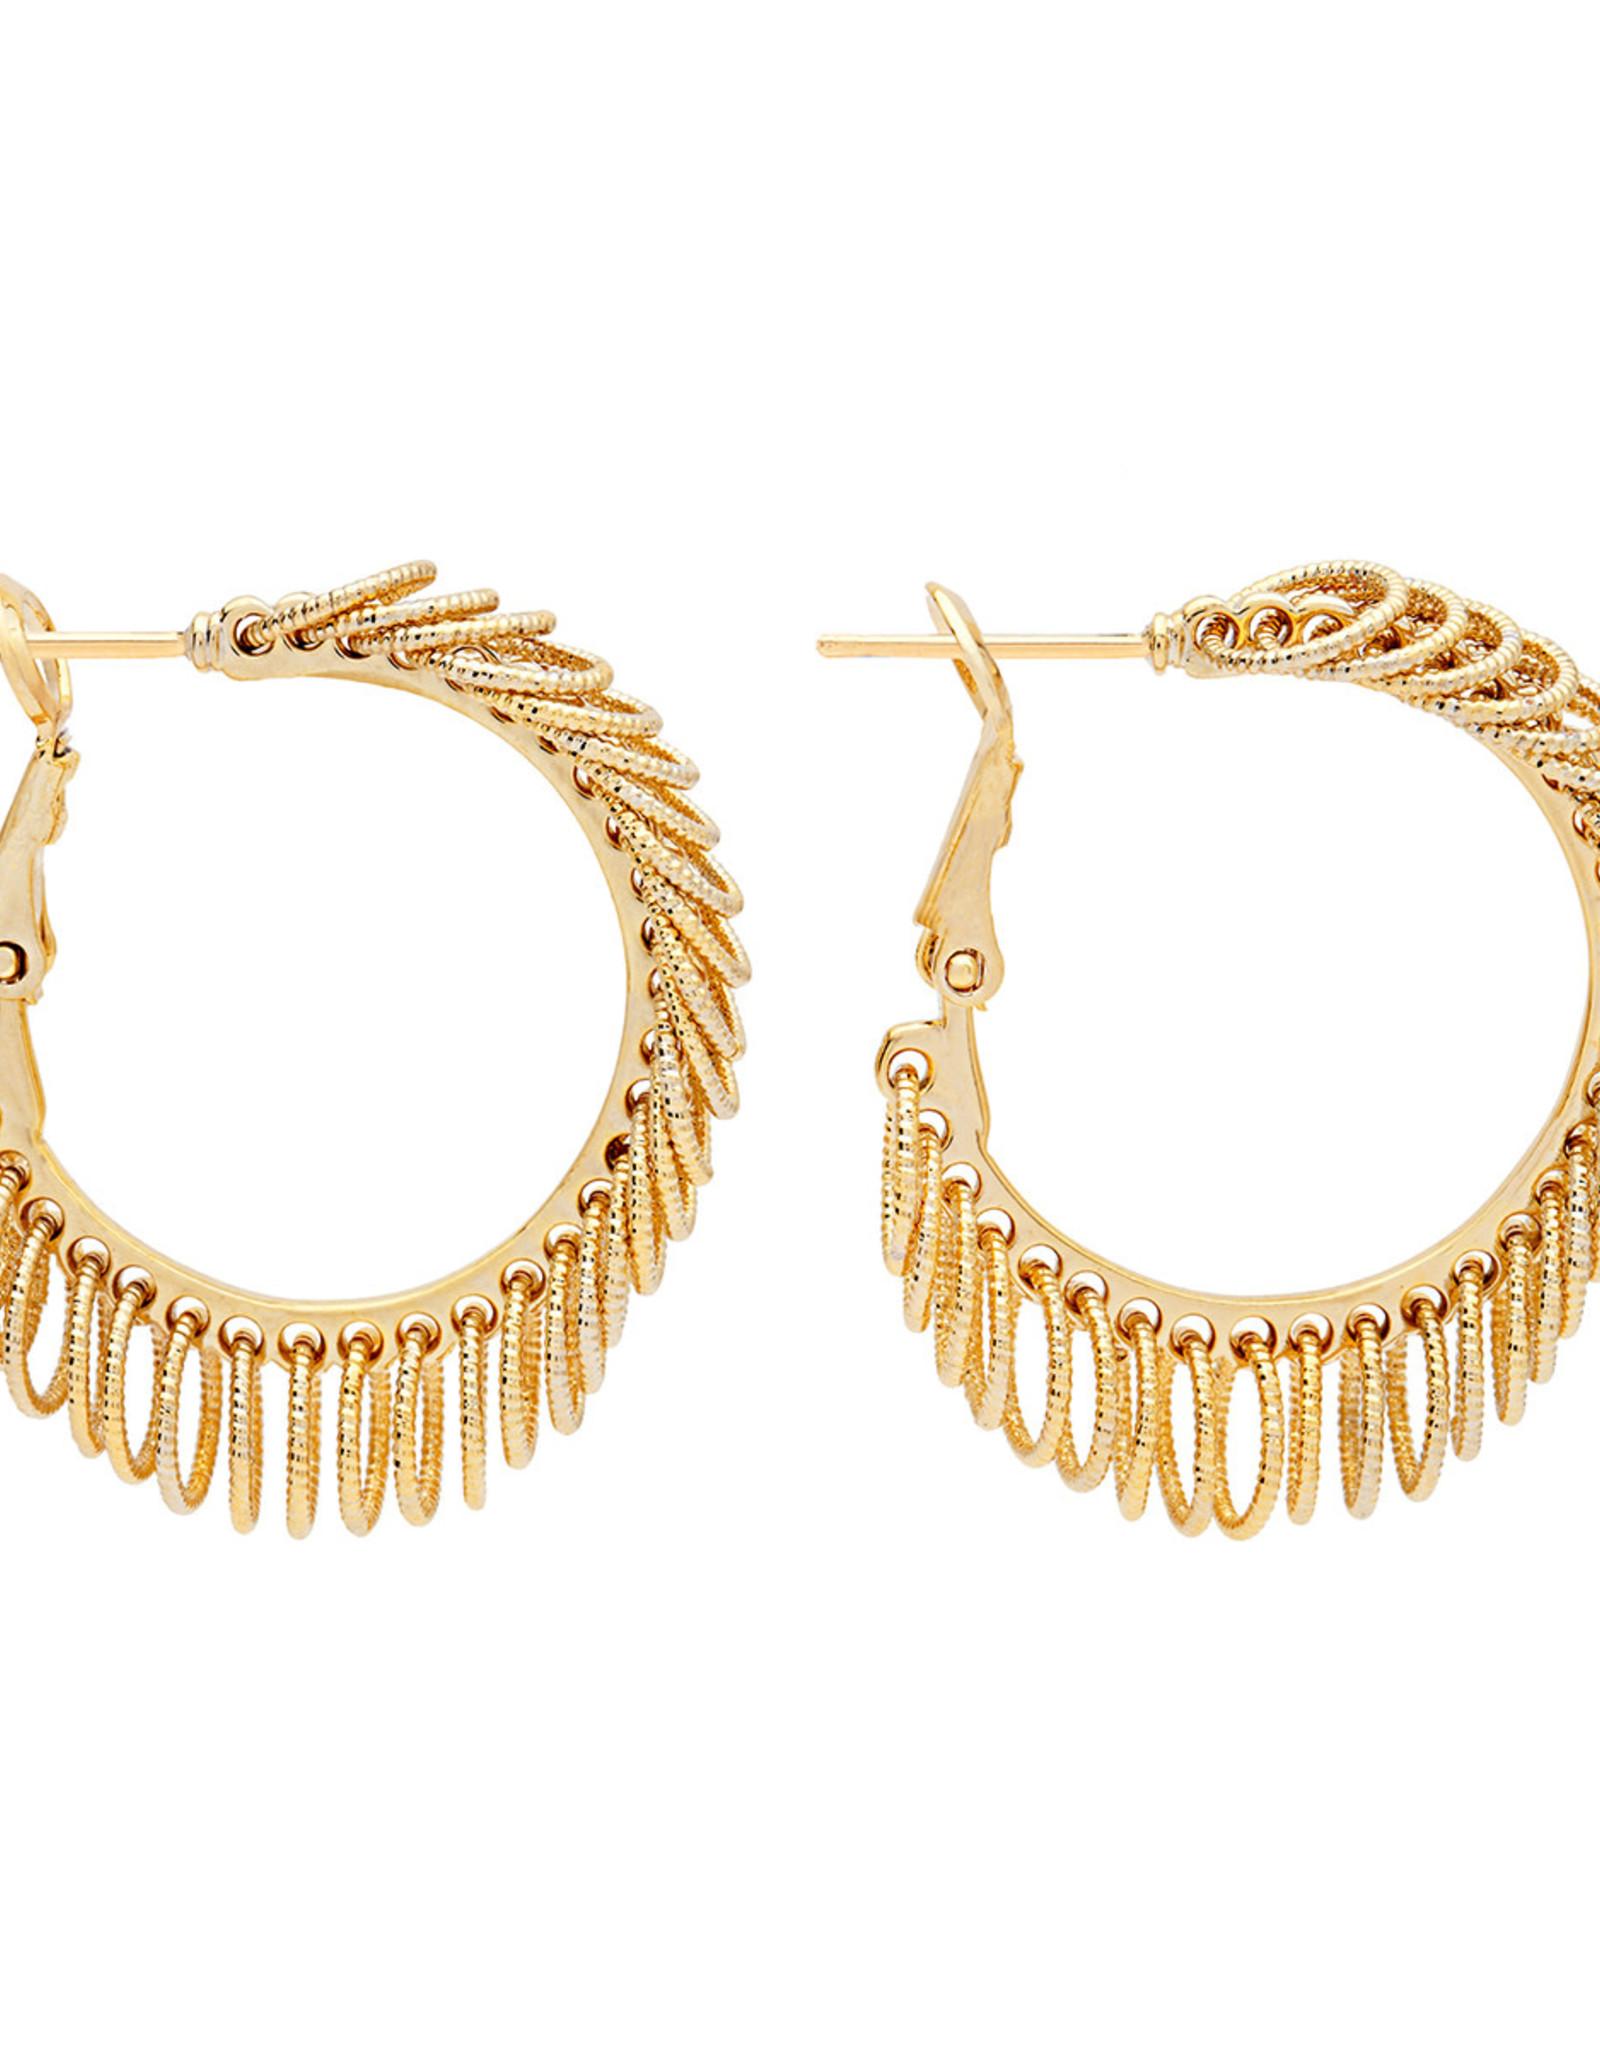 Amber Sceats Caitlin Earrings